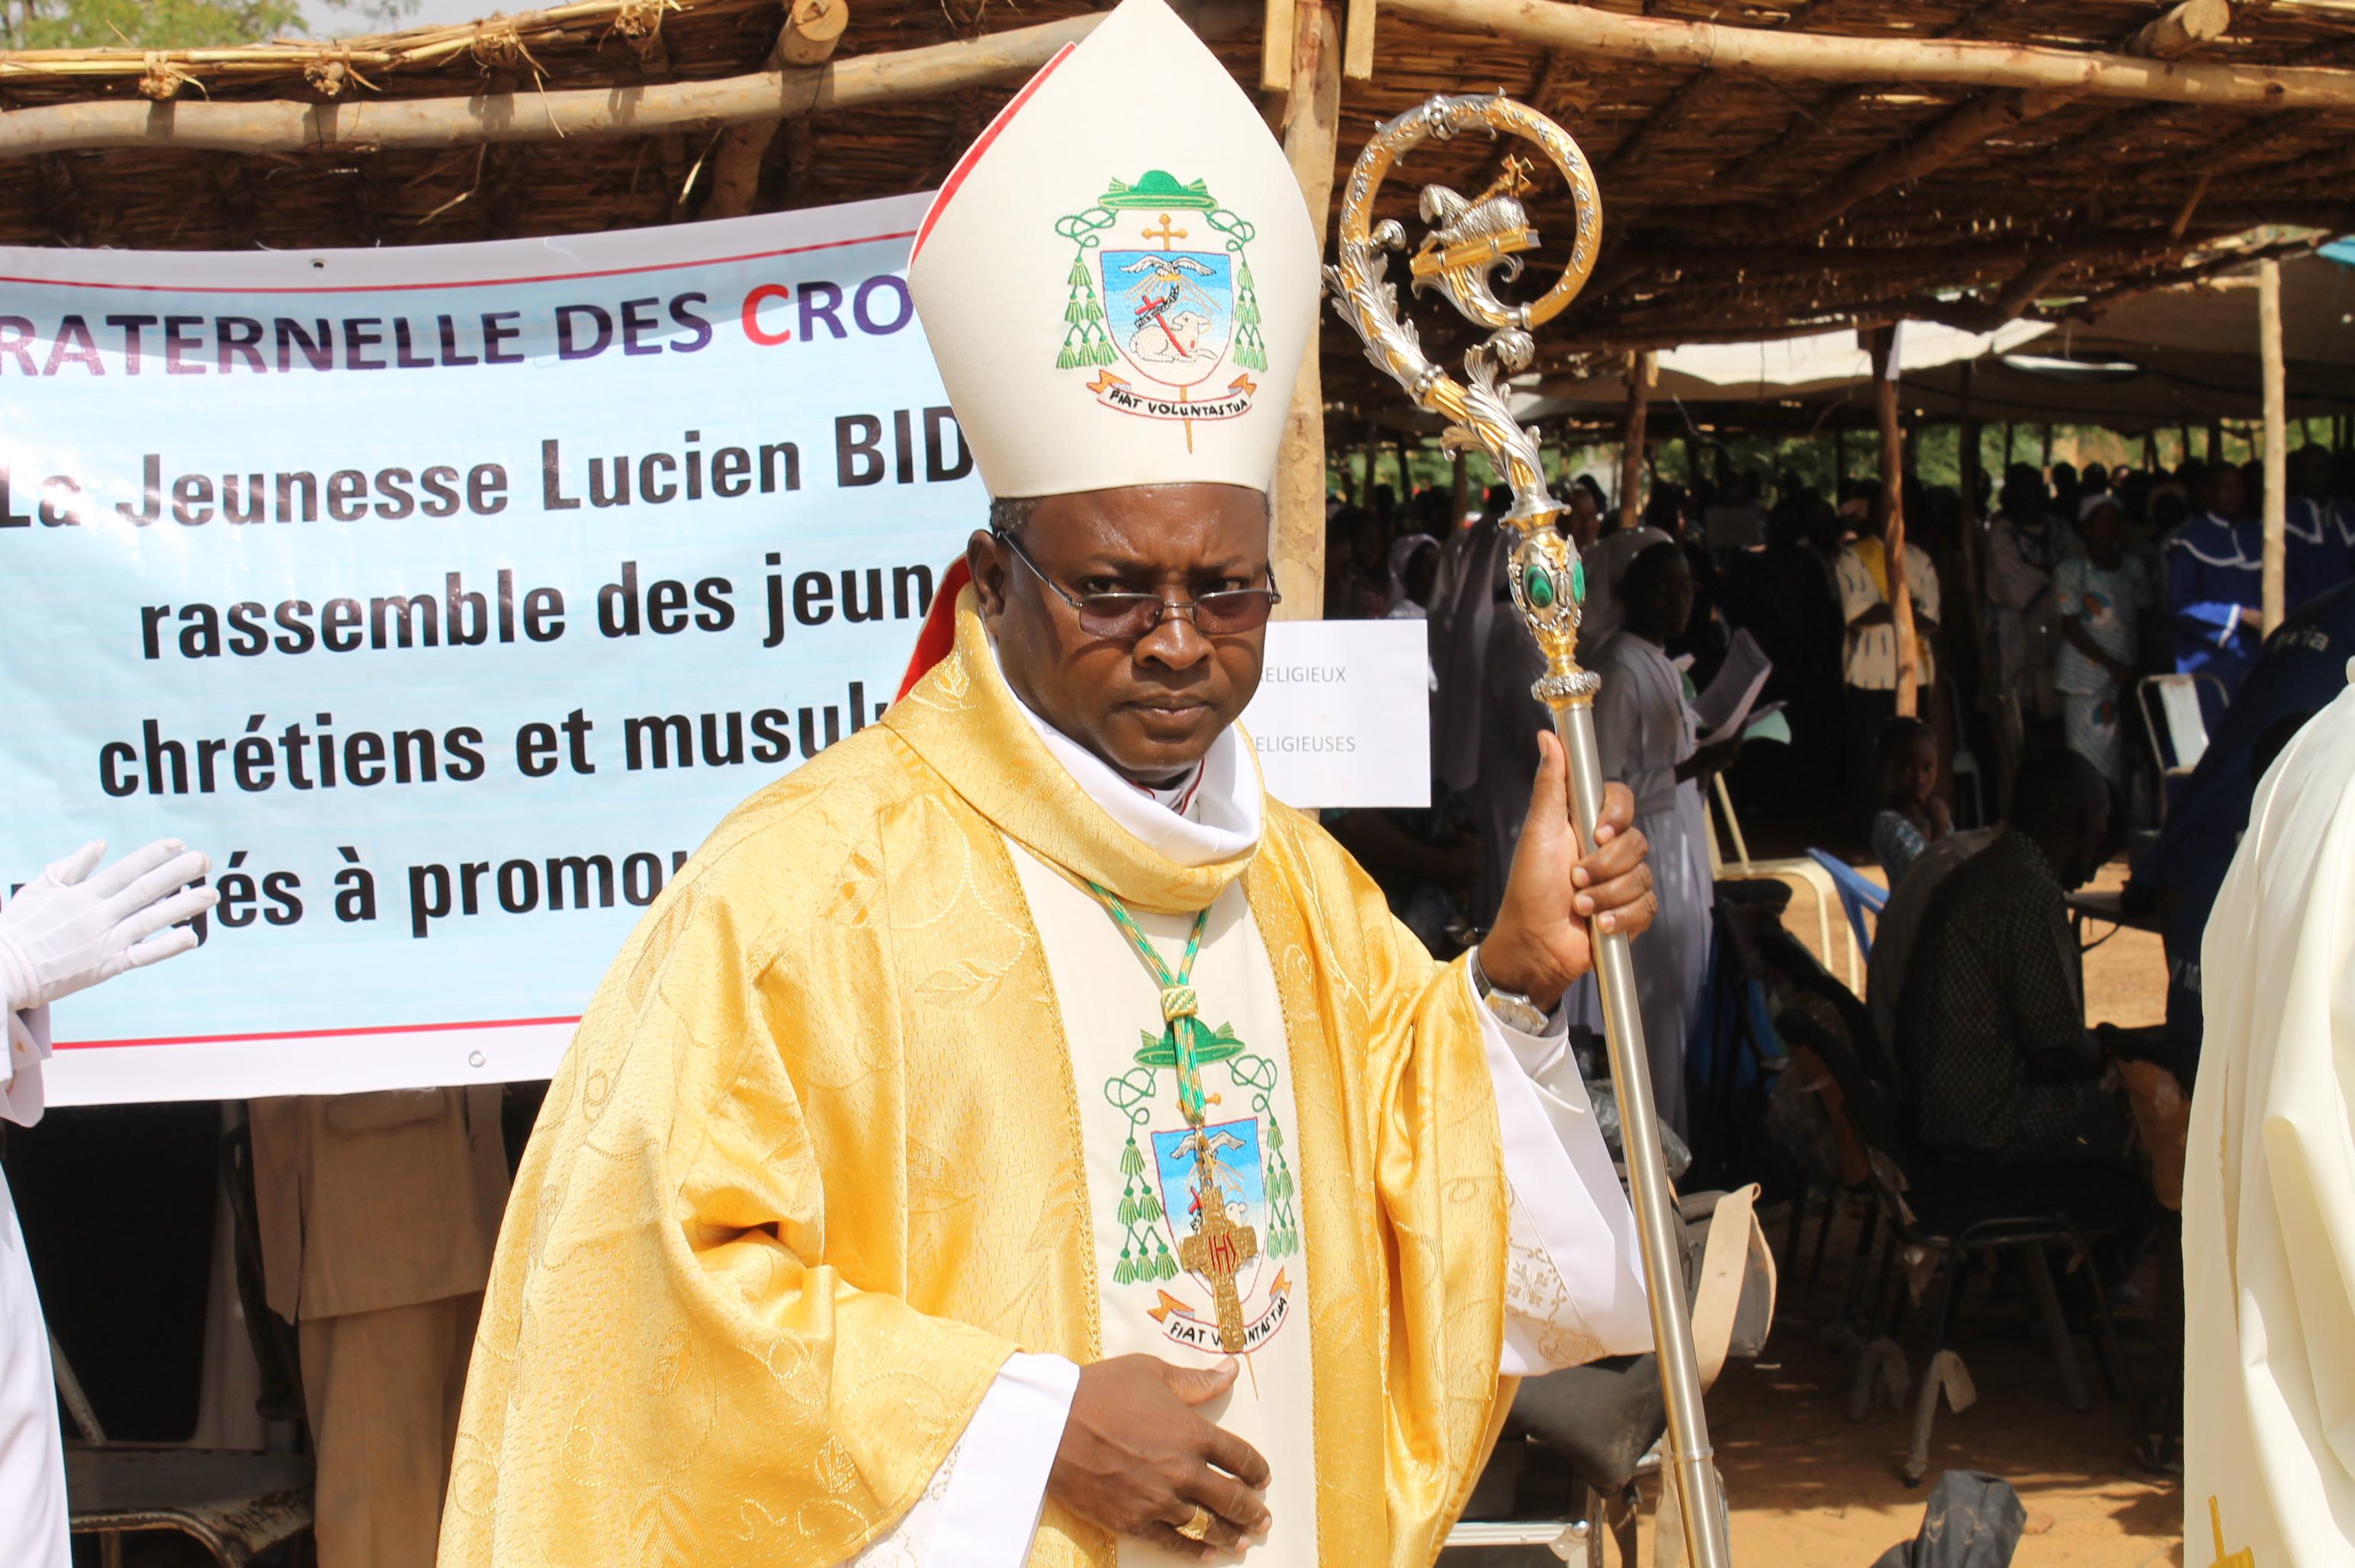 Burkina Faso Bishop Laurent Birfuoré Dabiré (© ACN)